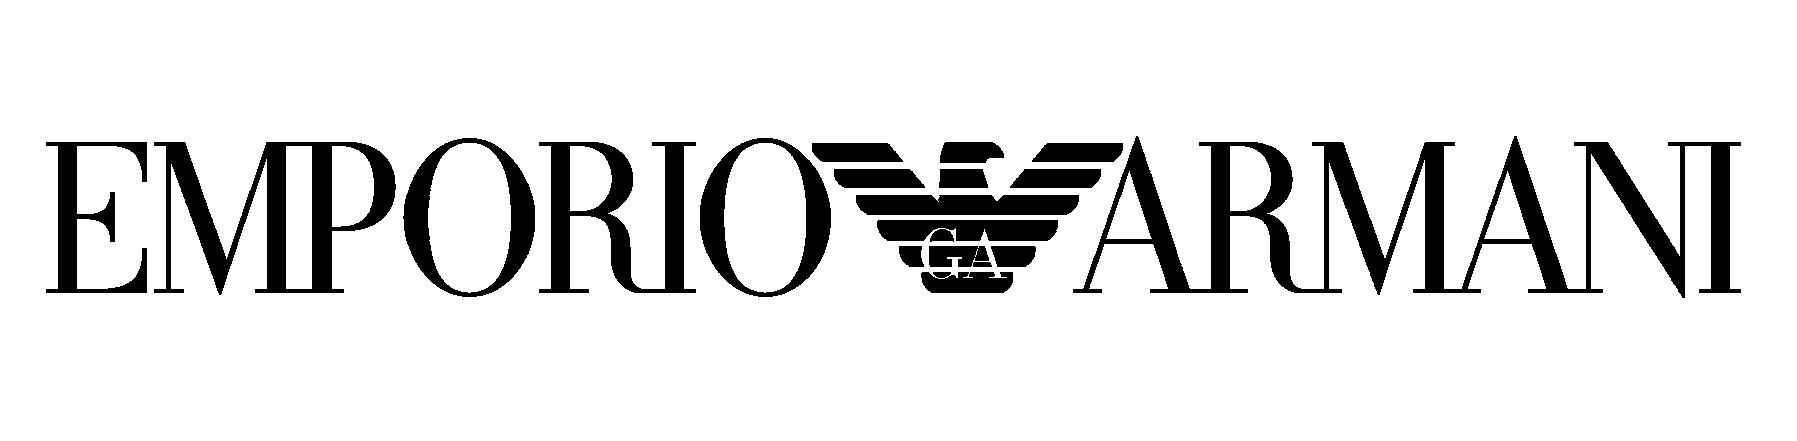 Les marques du pouvoir erostrate - Emporio giorgio armani logo ...